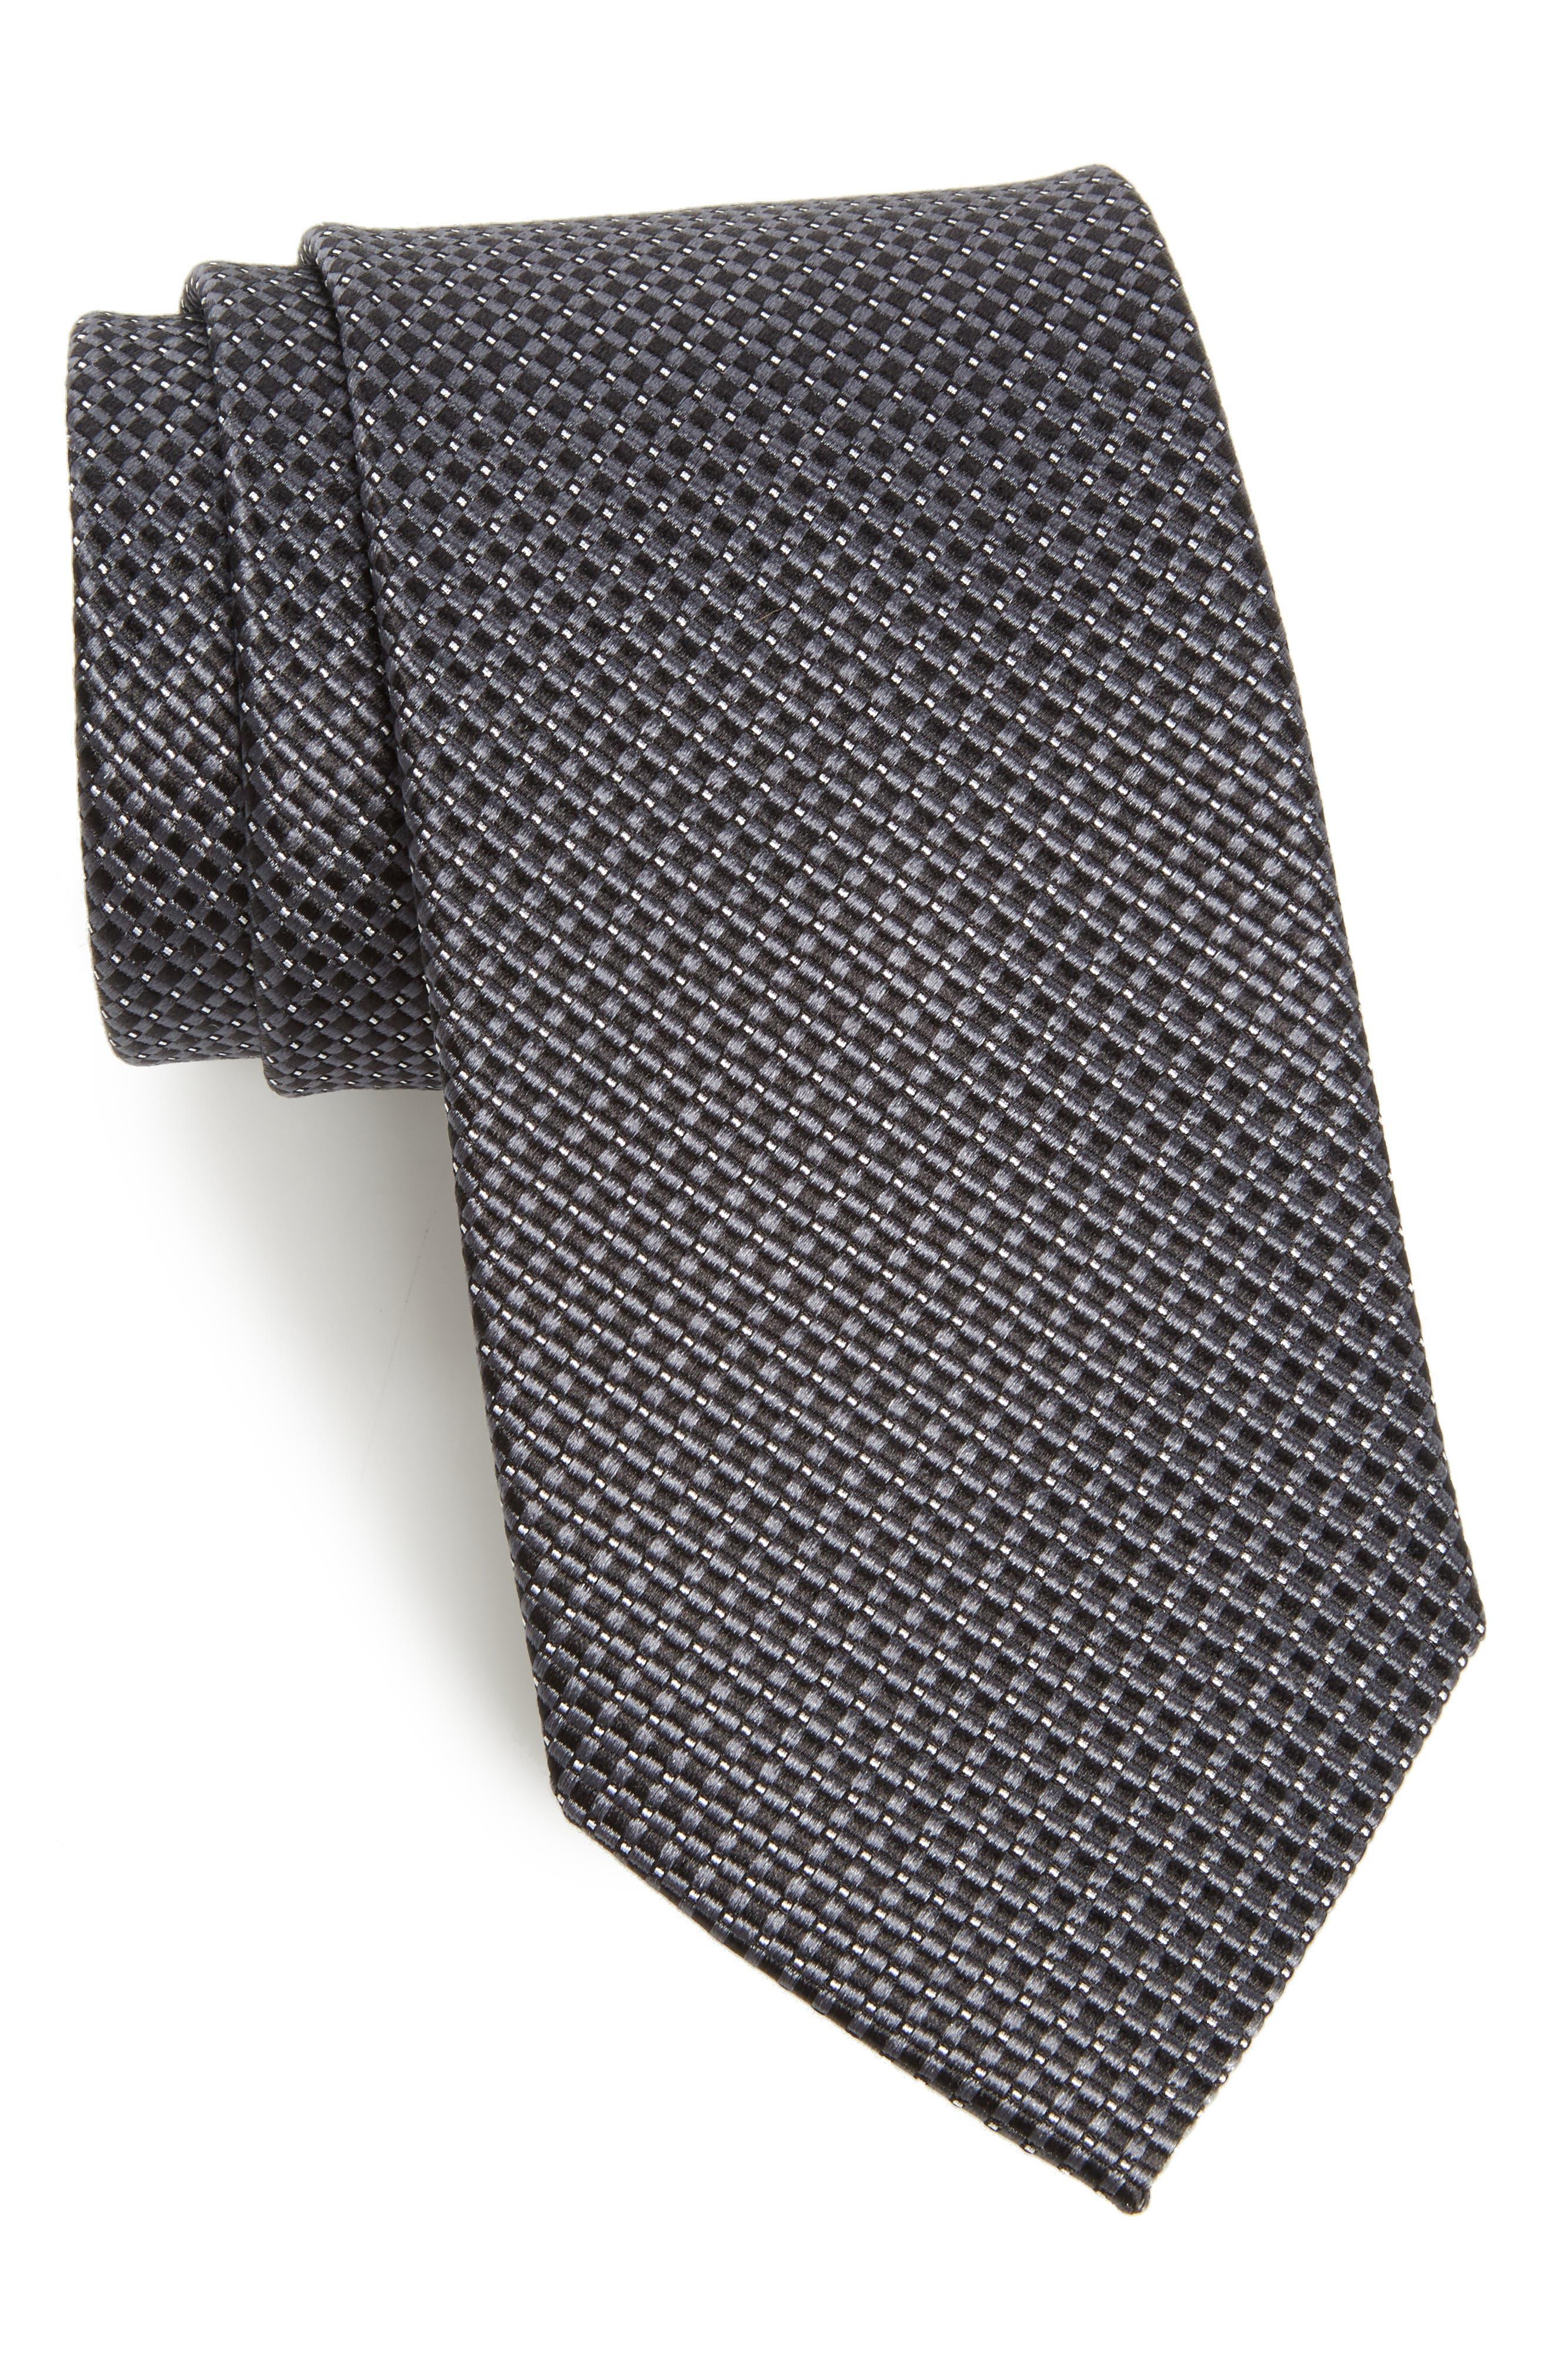 NORDSTROM MEN'S SHOP, Microgrid Silk Tie, Main thumbnail 1, color, BLACK